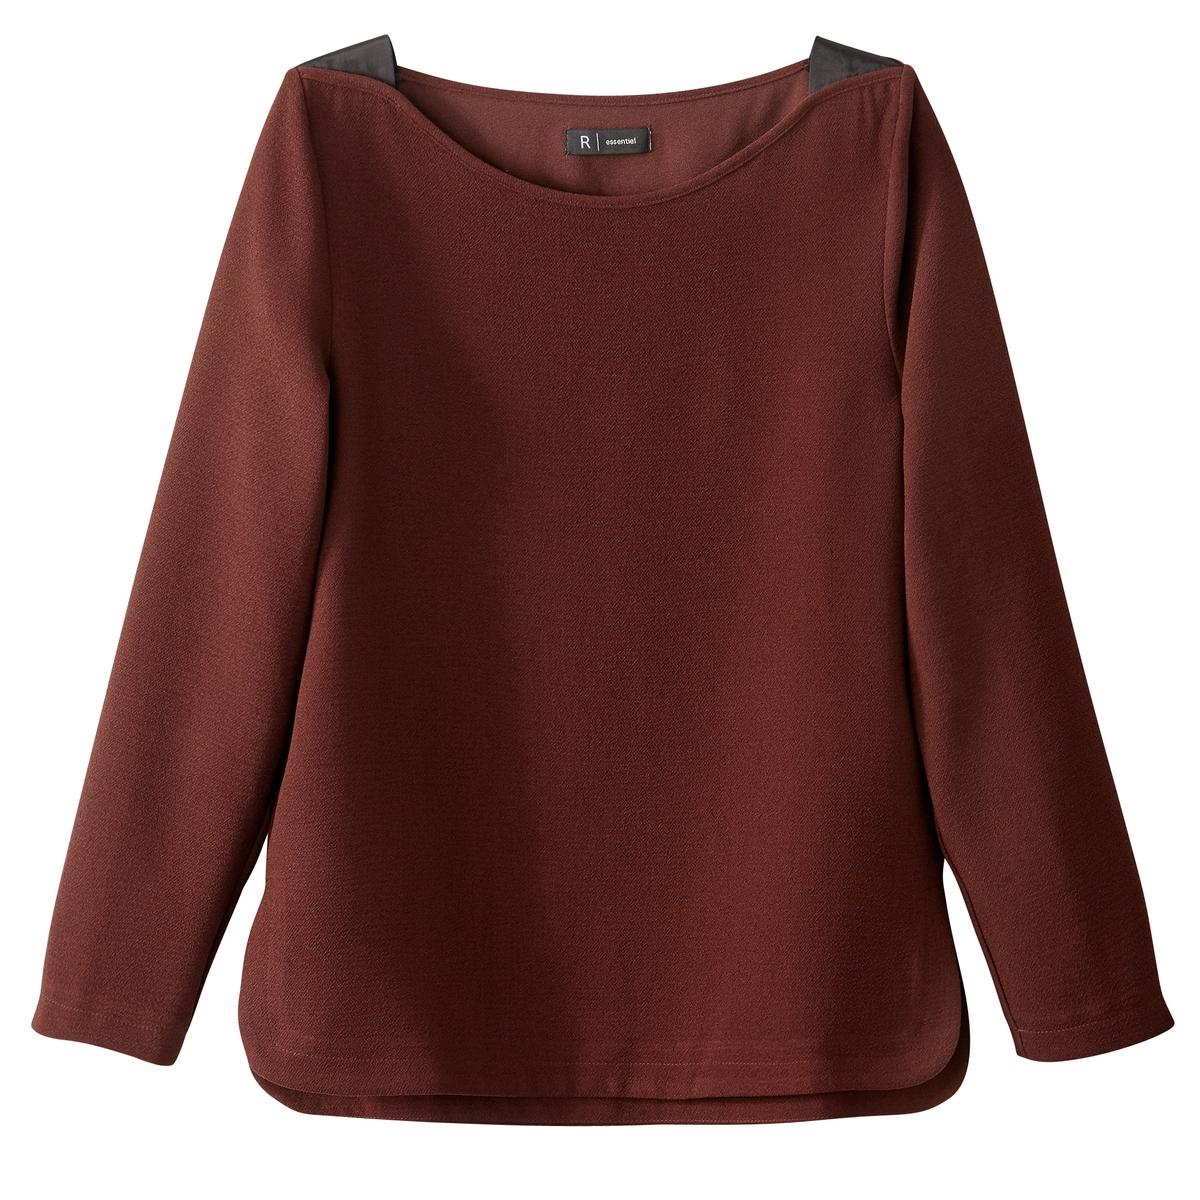 Блузка с разрезами по бокам и вставками на плечах